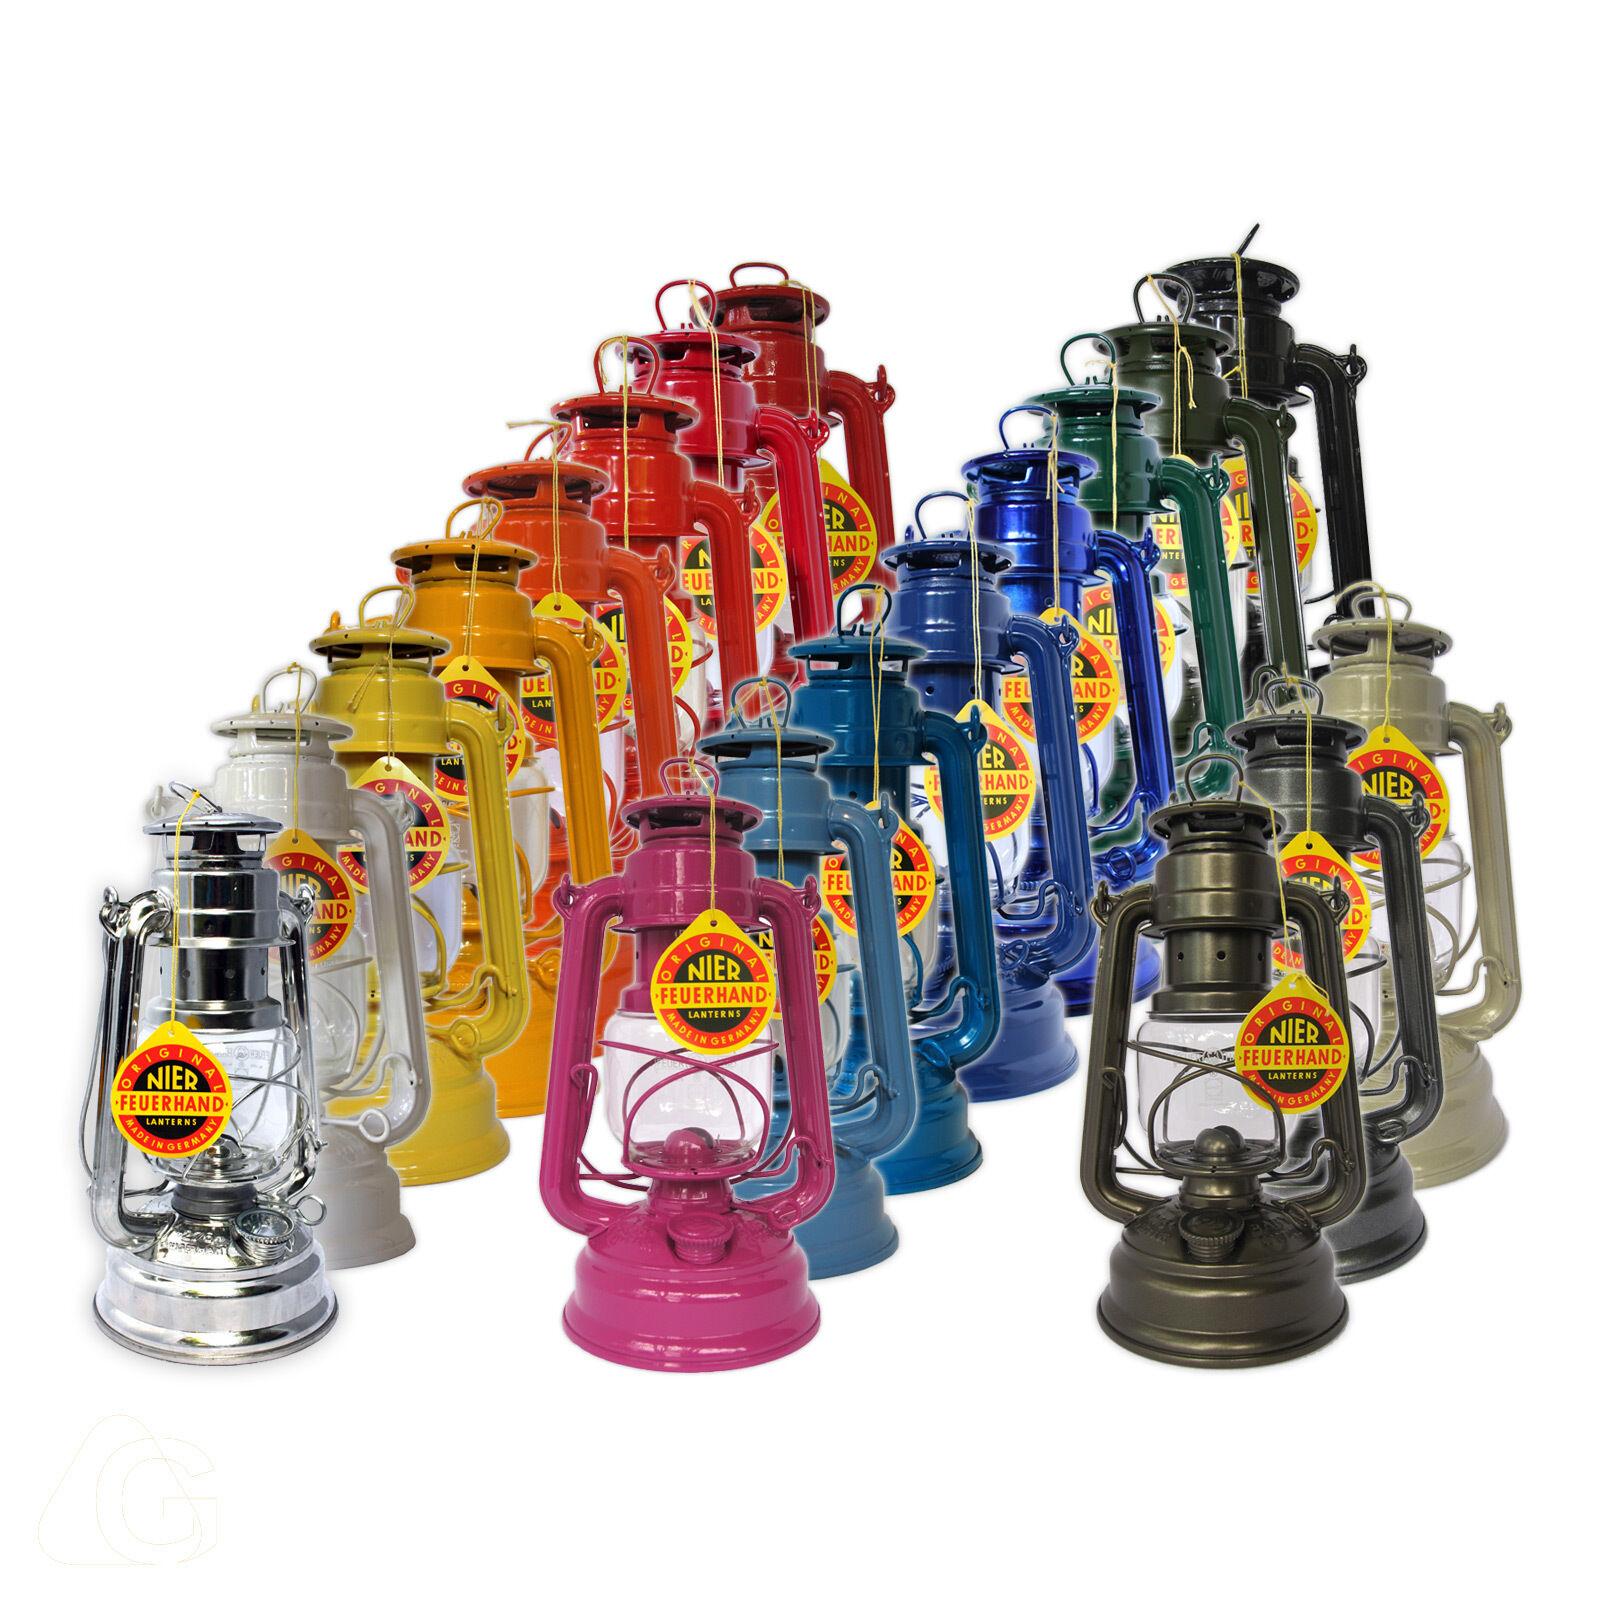 Feuerhand 276 Kepinkne Lamp Lantern Lamp Storm Lantern  Petroleum New in Set  good reputation